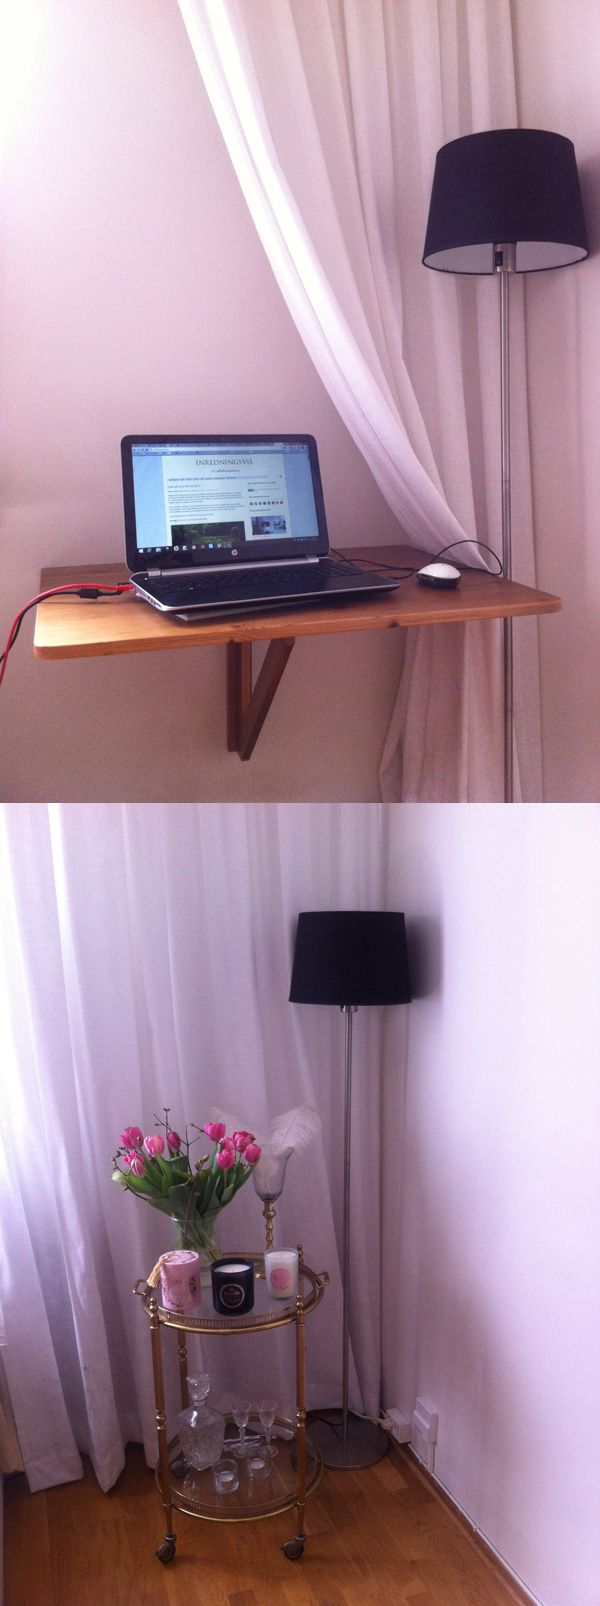 CLICK ON LINK TO SEE - HOW TO GET A HOME OFFICE TURN TO A GLAM CORNER IN ONE SEKUND - http://inredningsvis.se/inredningstips-hemmakontor-blir-glam-horna/  #howto #homeoffice #officefurniture #homedecor #hemmakontor #kontor #föreefter #inredning #inredningstips